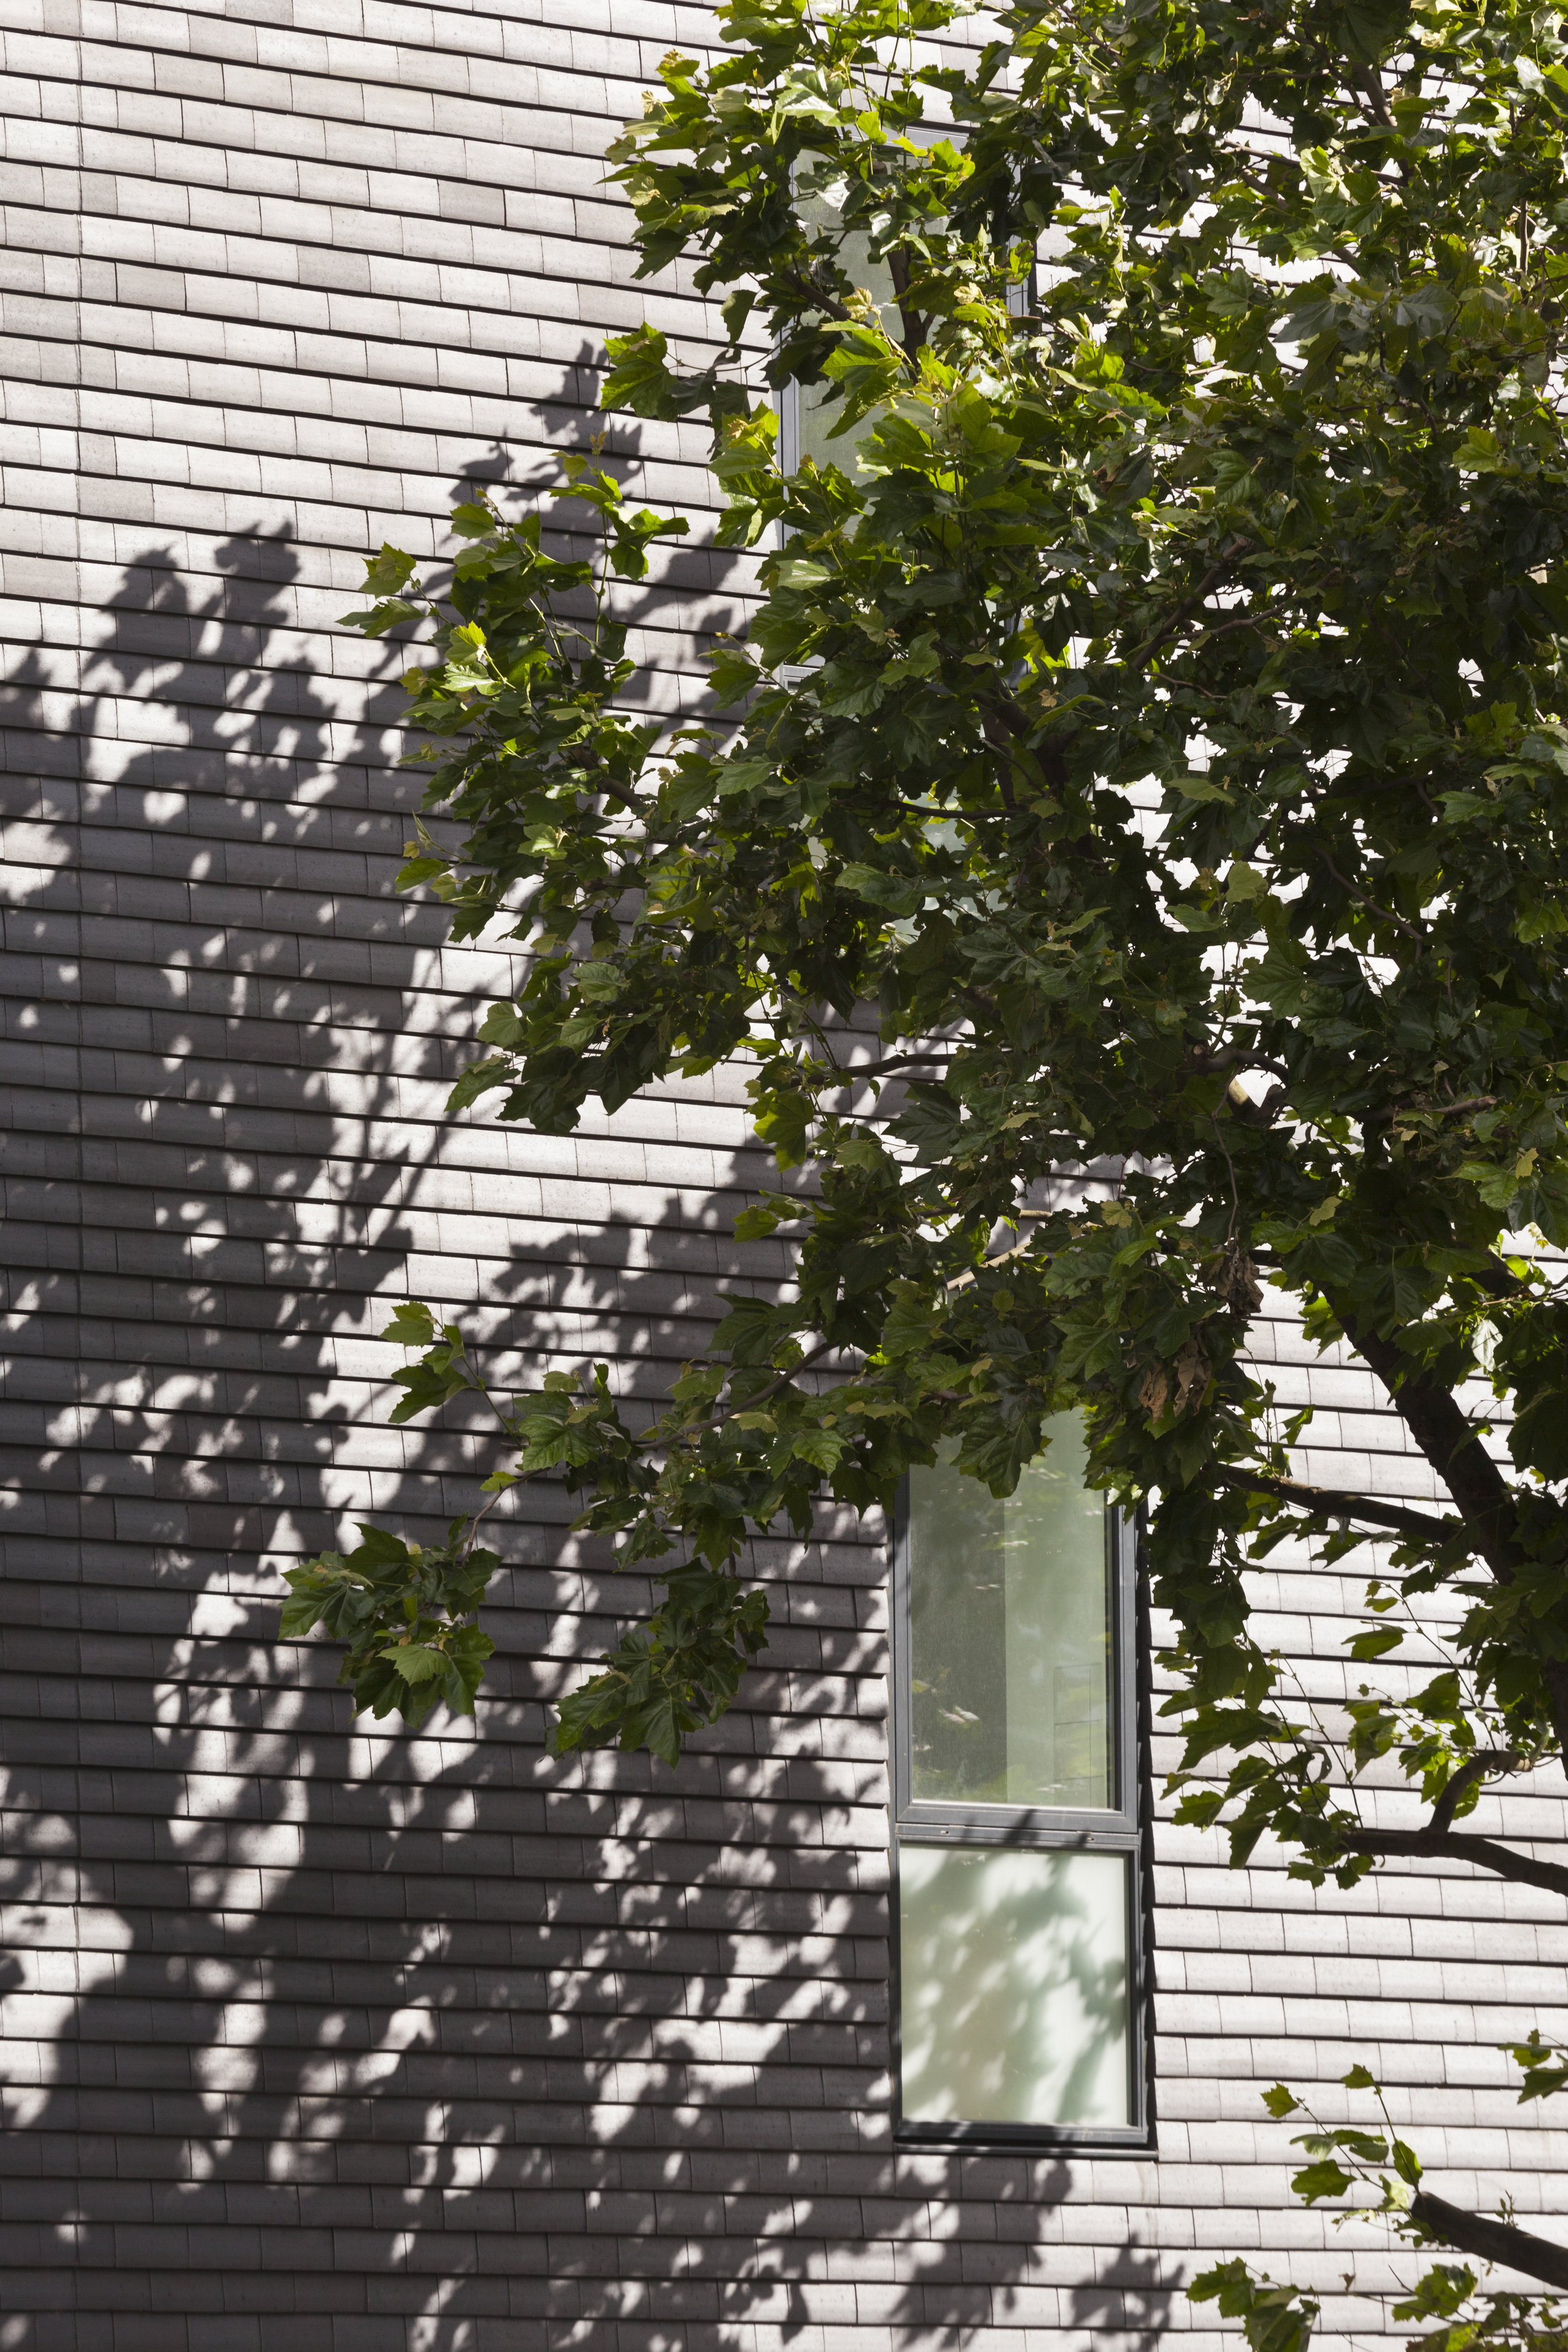 Window Detail of Housing Development for Igloo Regeneration and Hexagon Housing in Bermondsey